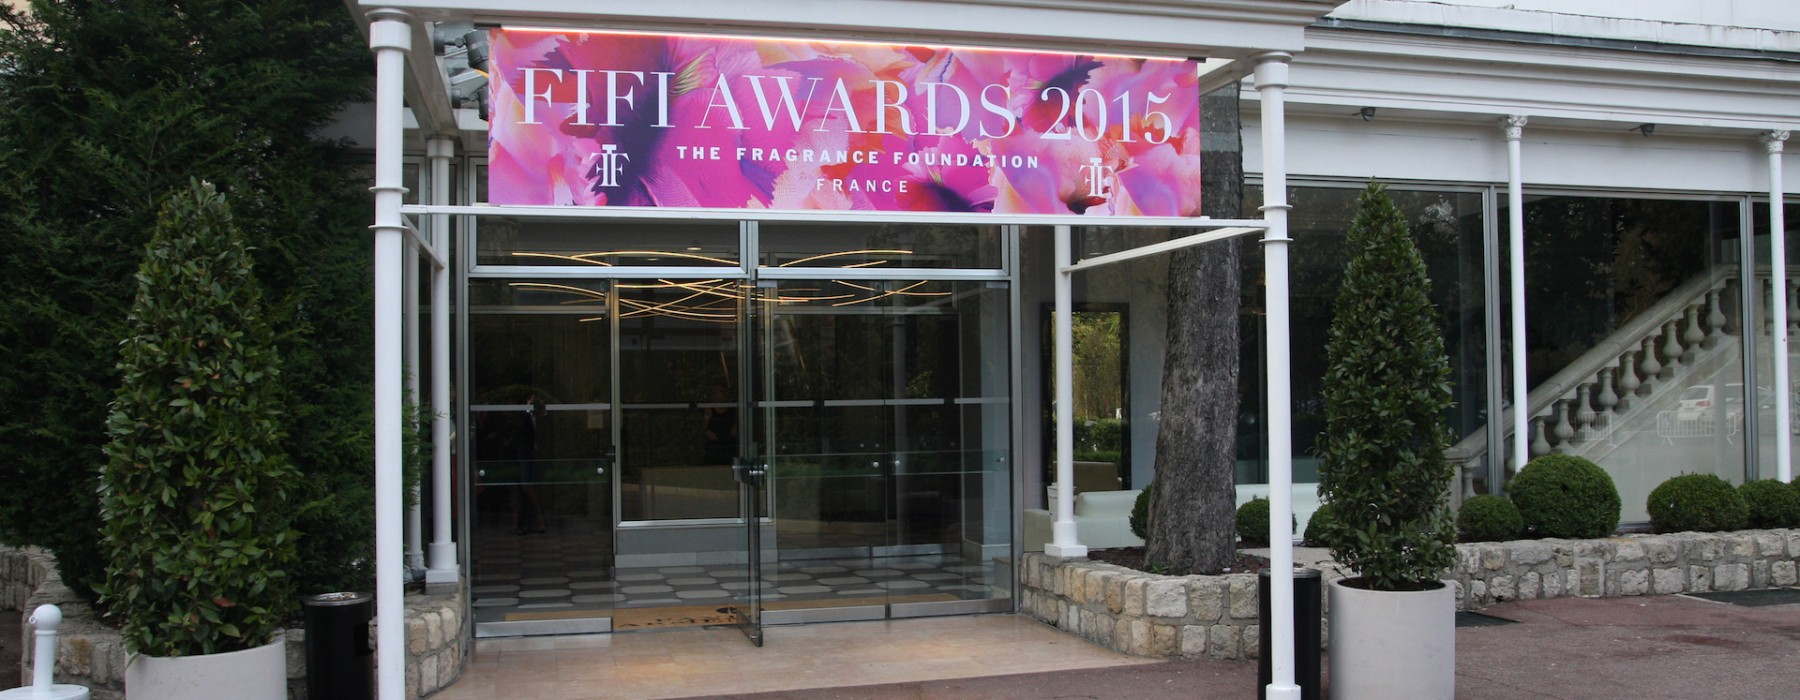 FIfI Awards 2015, les parfums masculins récompensés